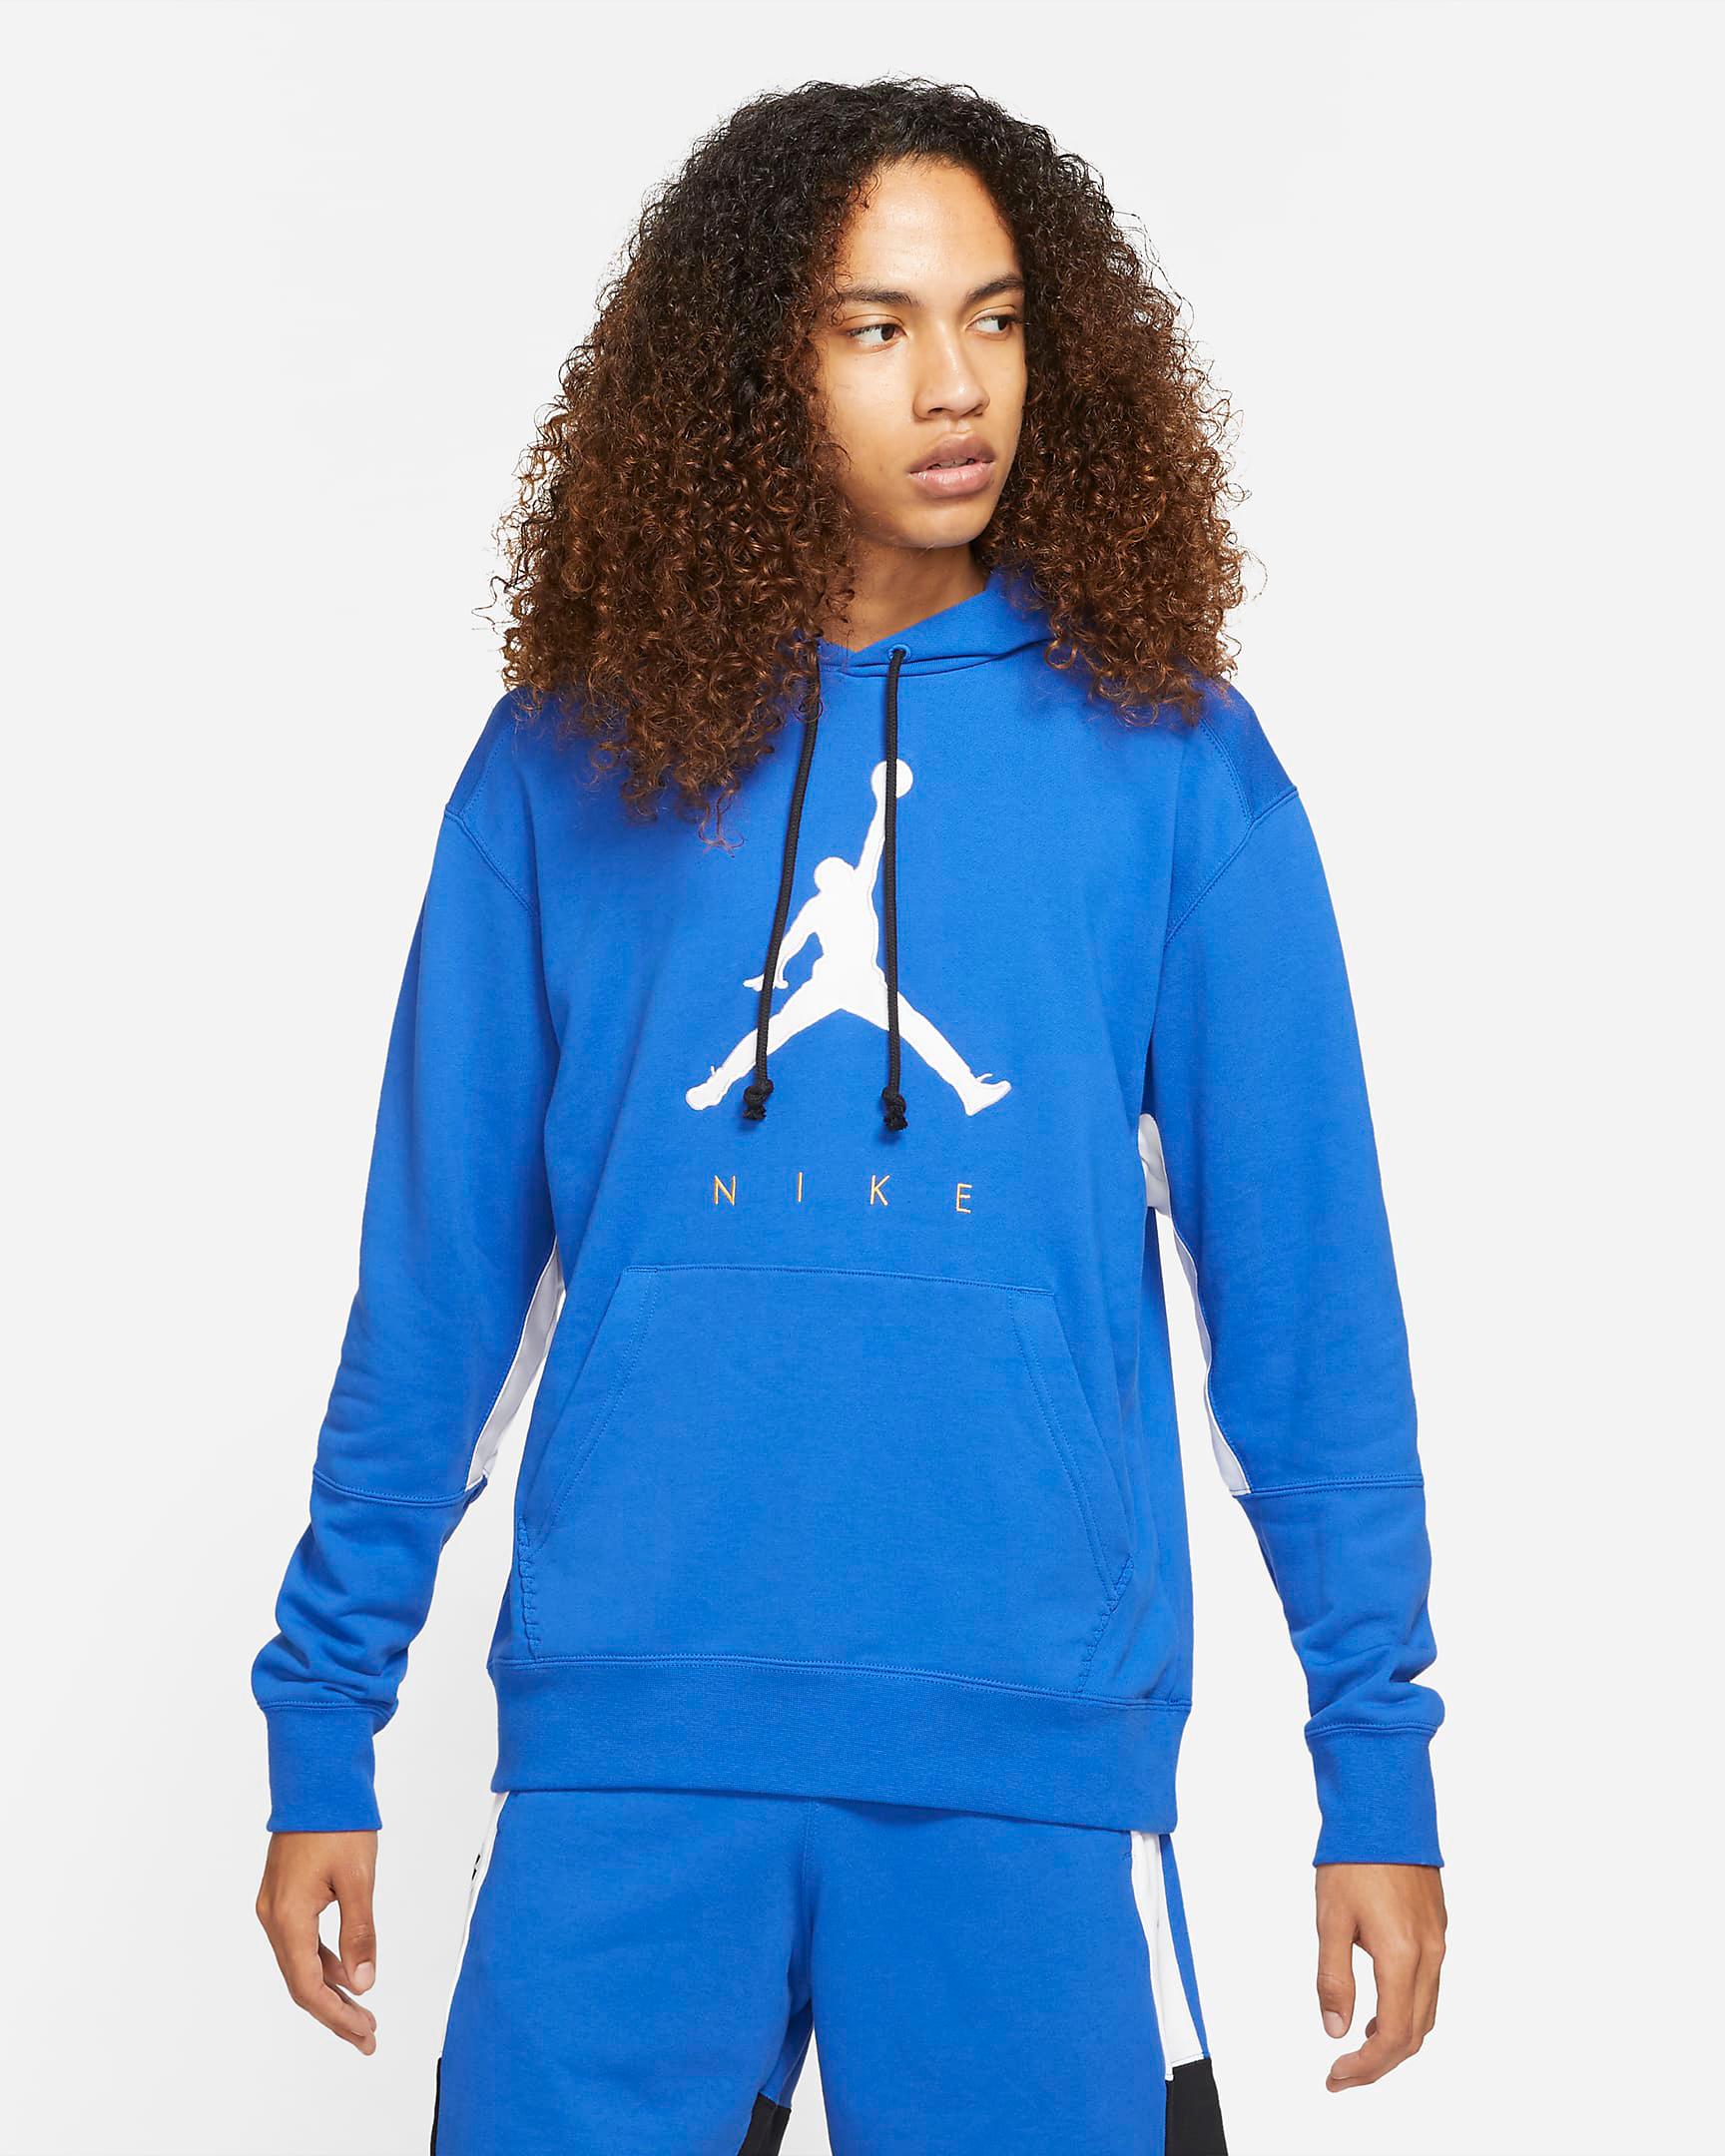 jordan-game-royal-jumpman-hoodie-1